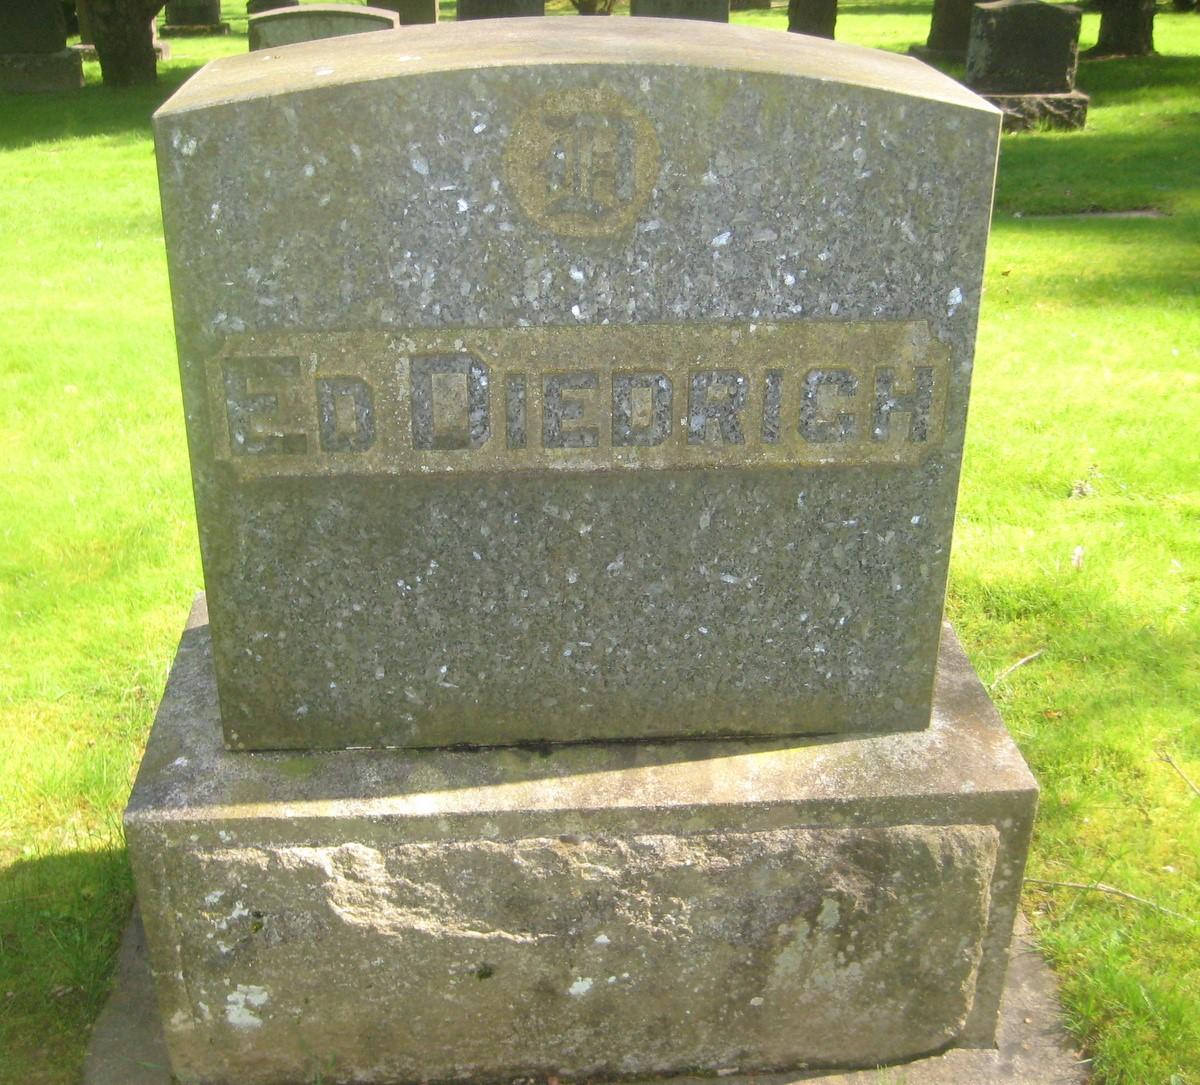 Superintendent Ed Diedrich | Multnomah County Sheriff's Office, Oregon